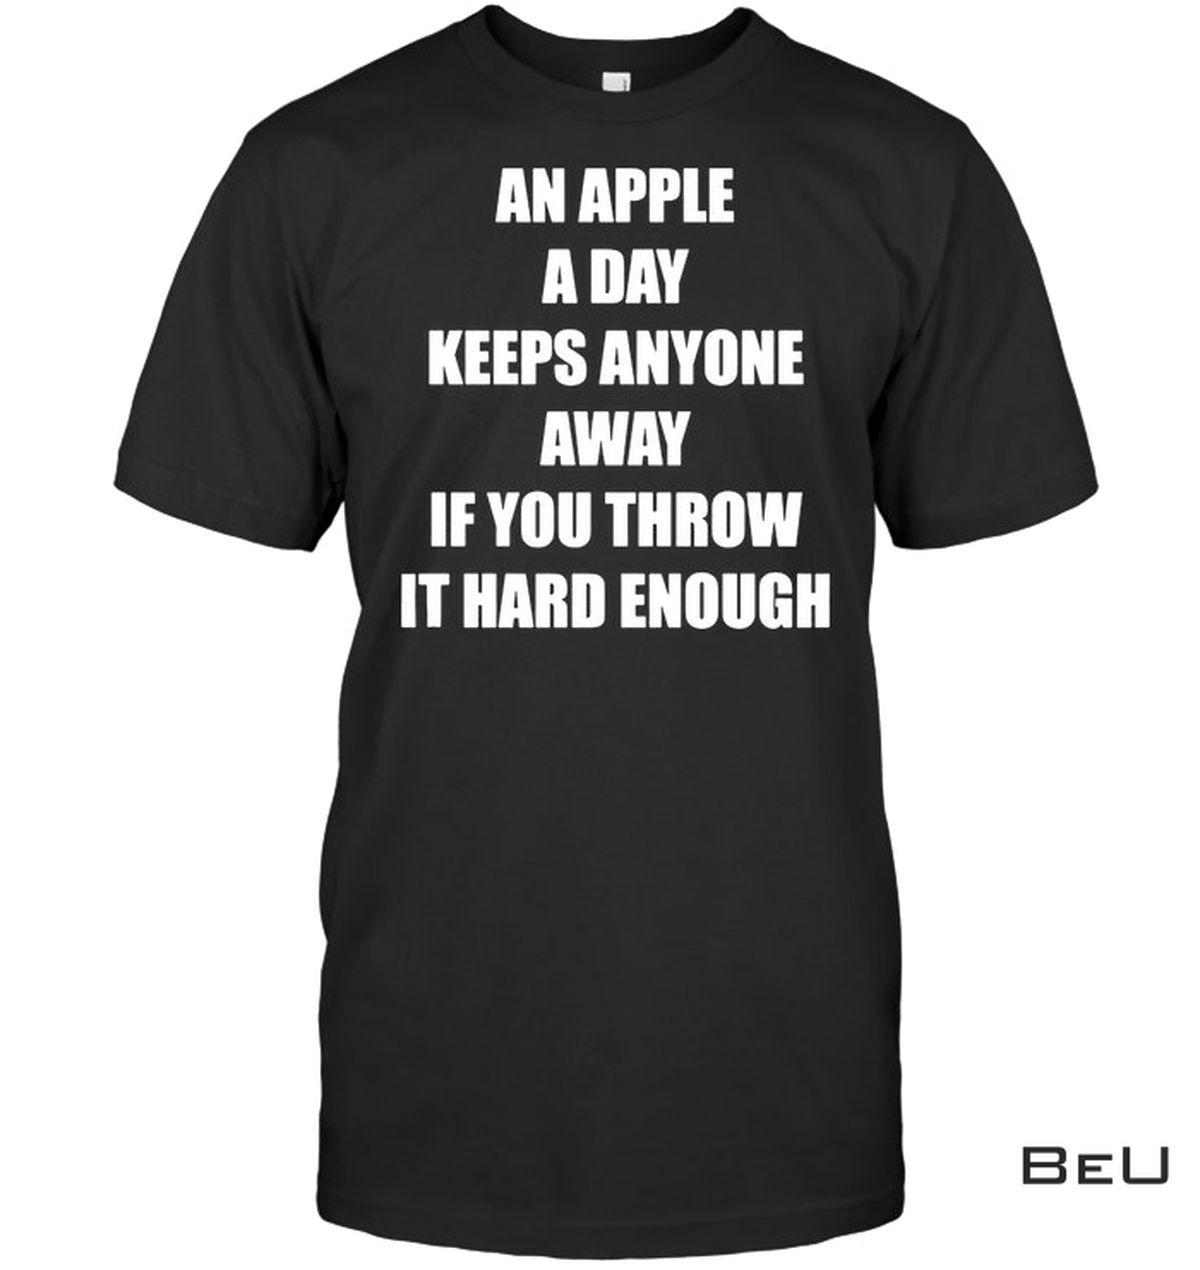 An Apple A Day Keeps Anyone Away Shirt